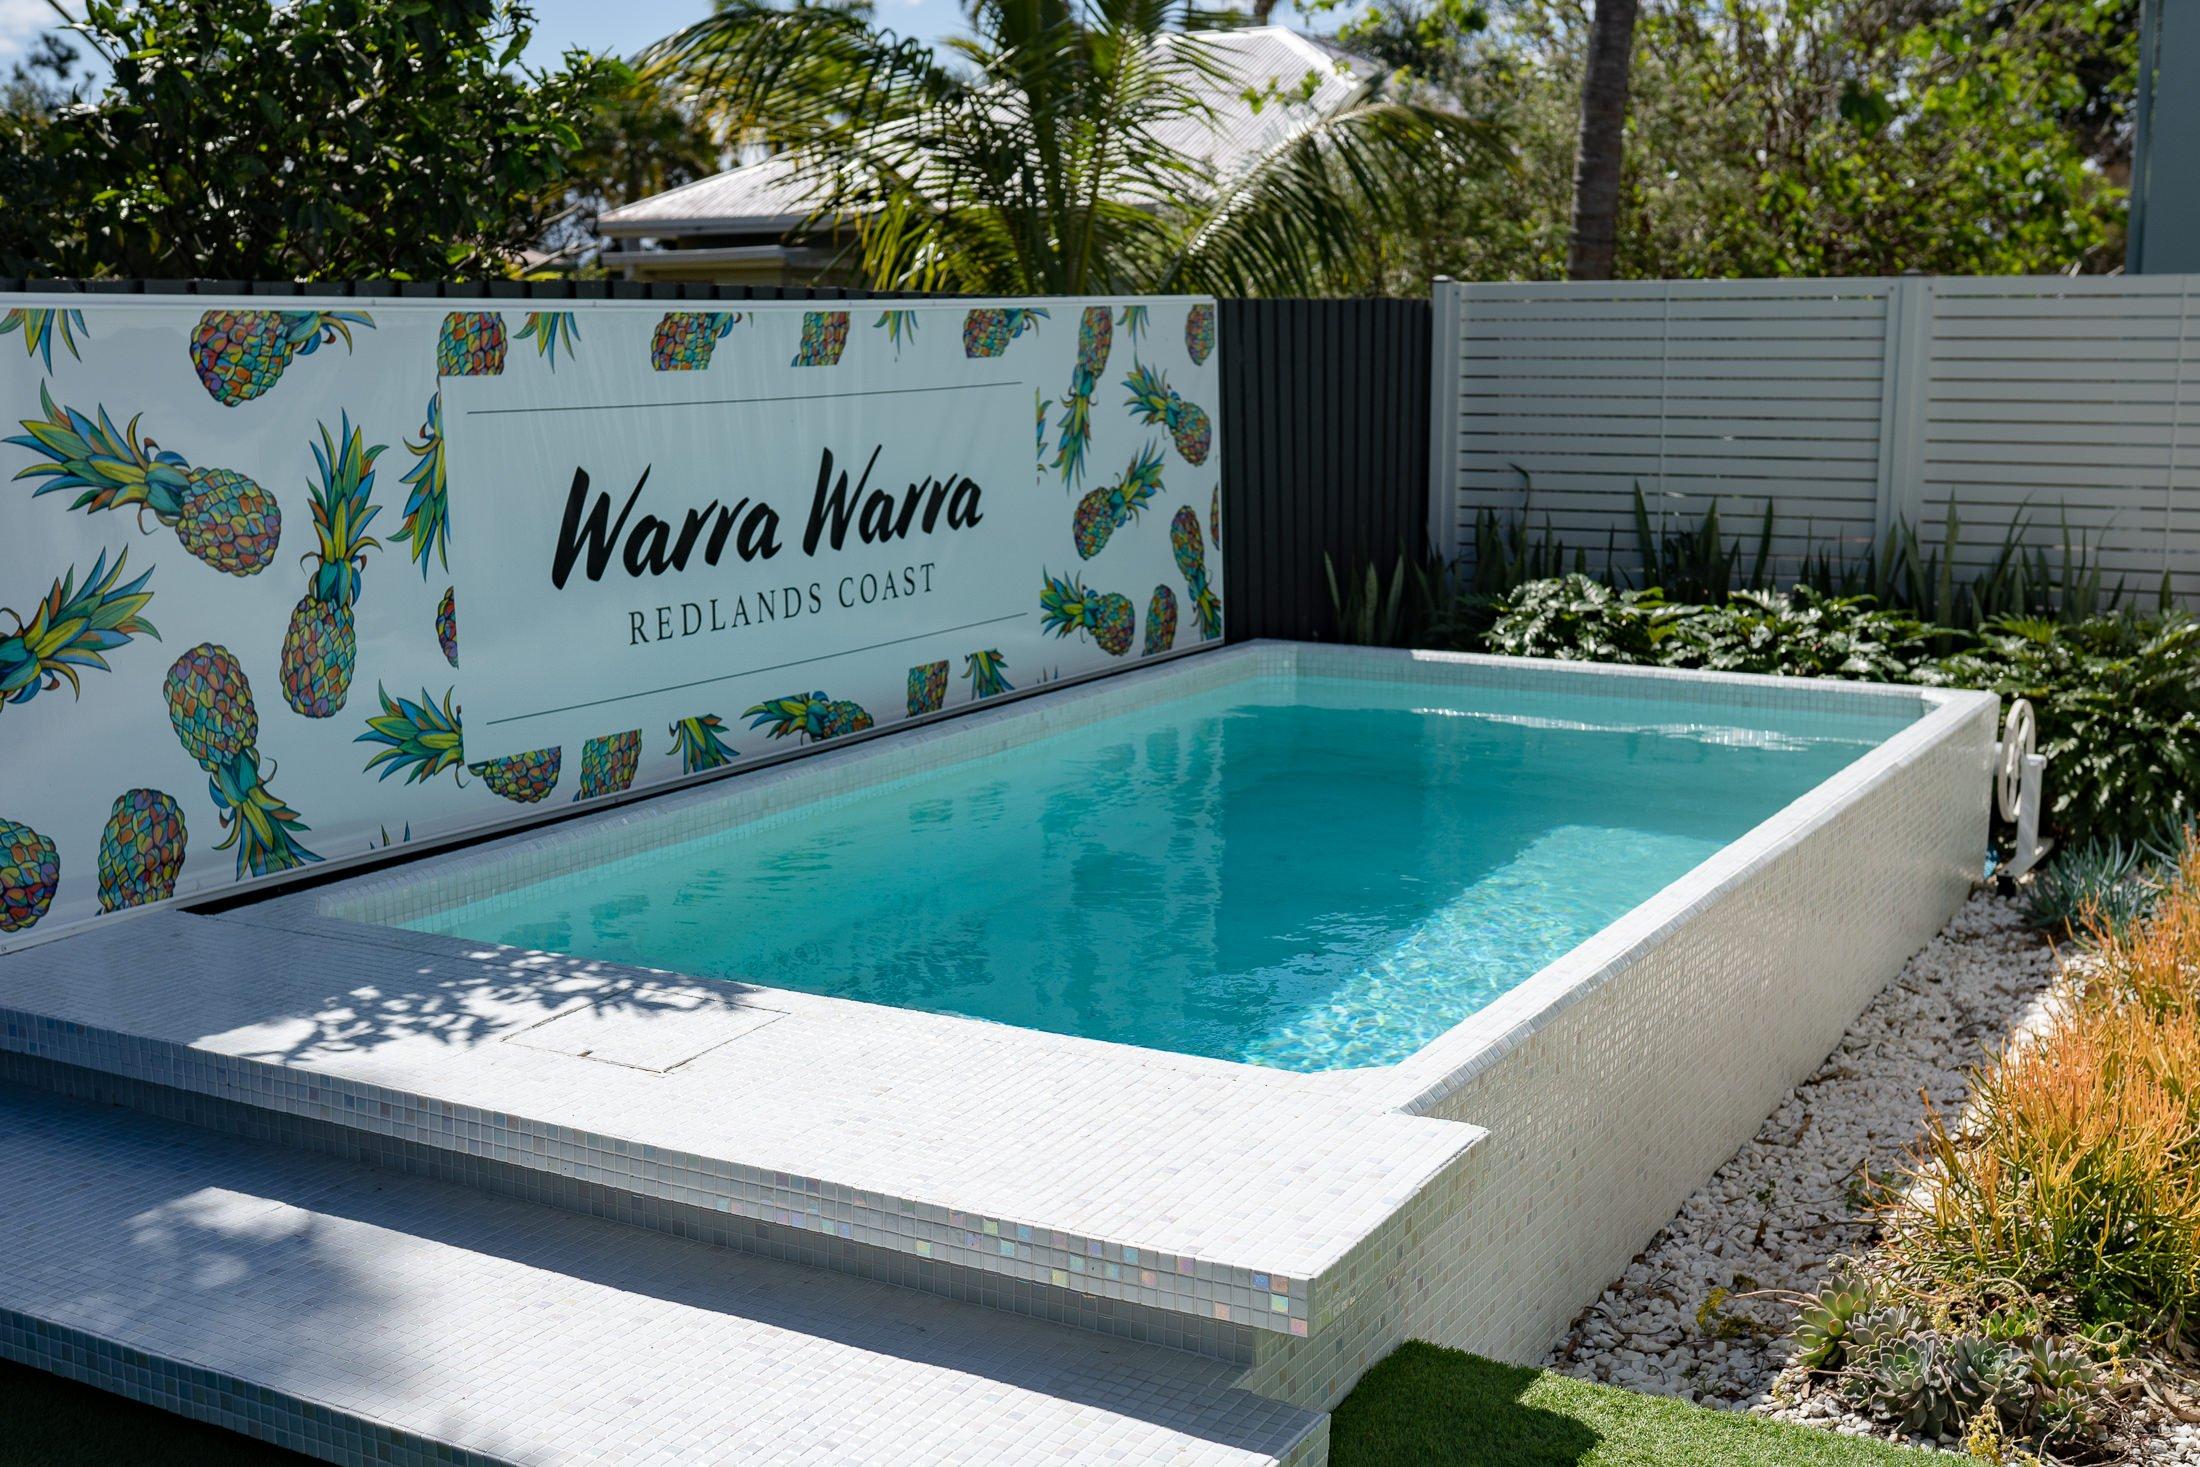 Plungie Original 4.6m x 2.5m pool in Kona Coast